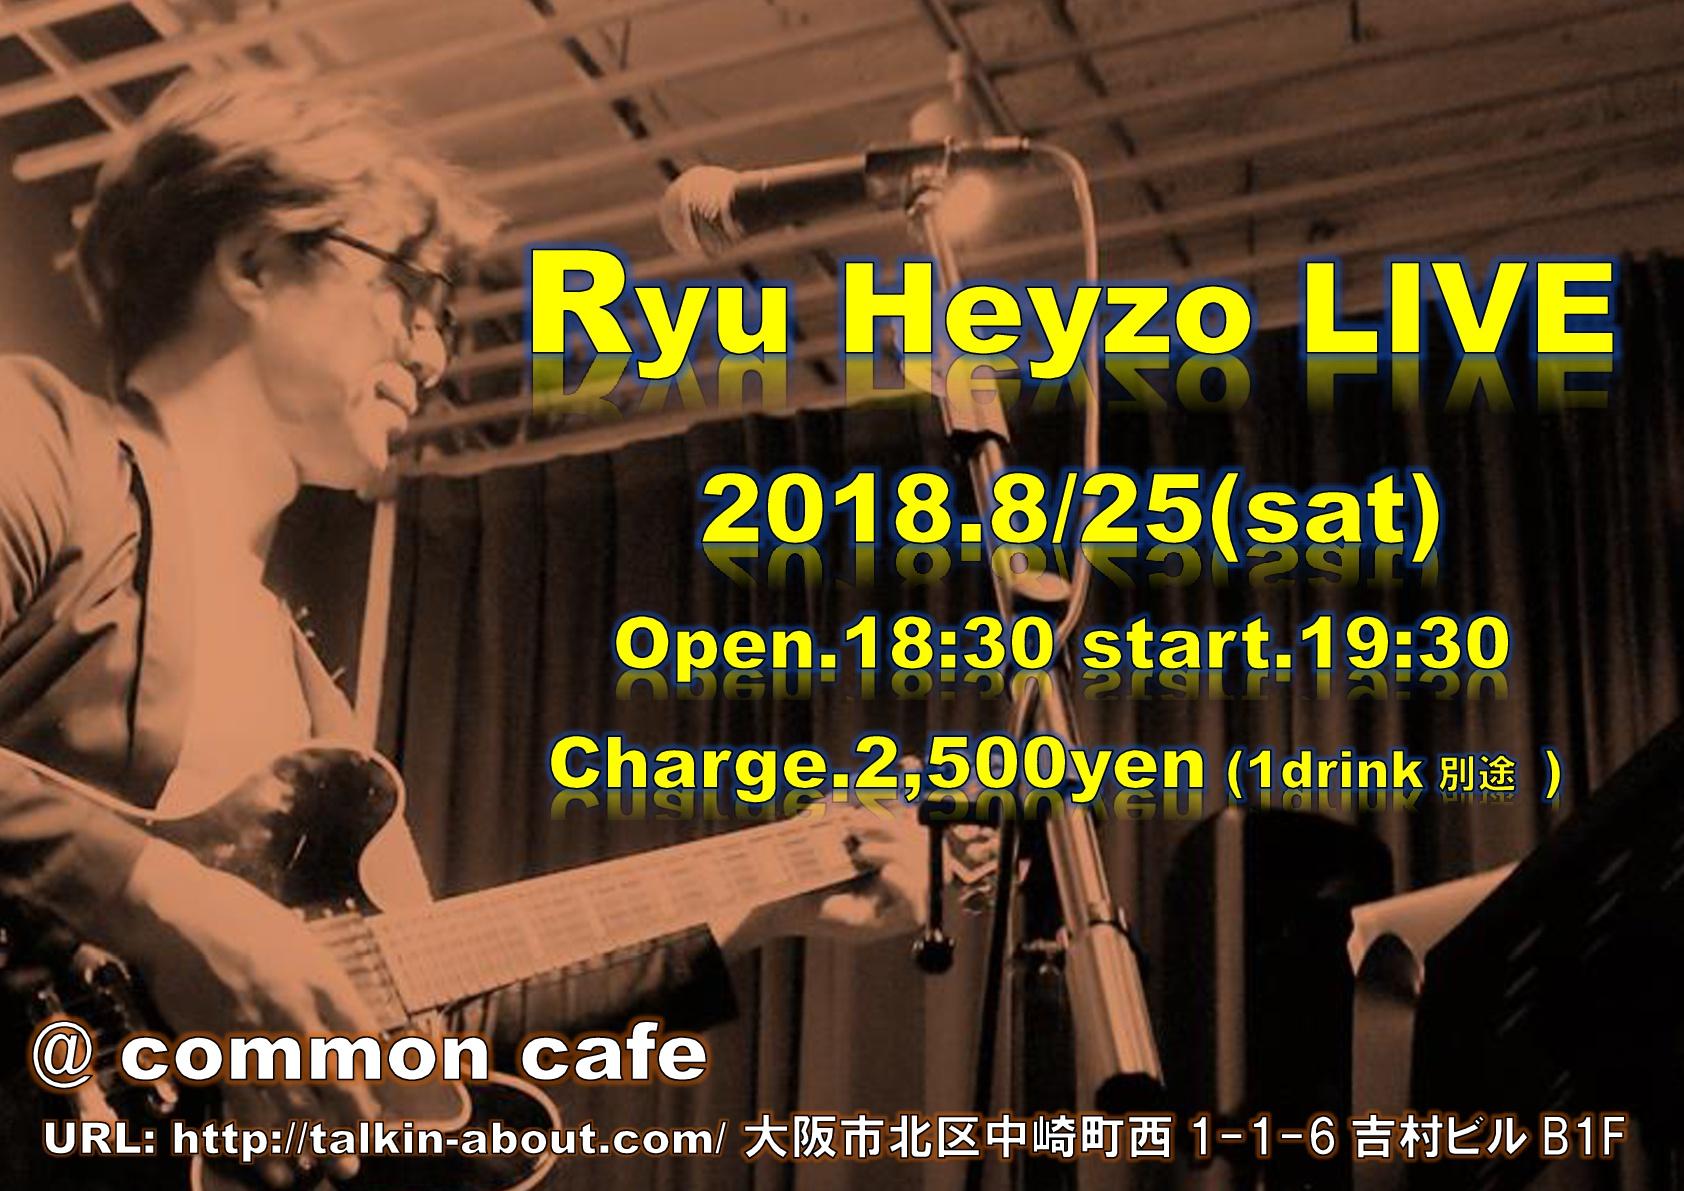 Ryu'sイベント Ryu Heyzo LIVE